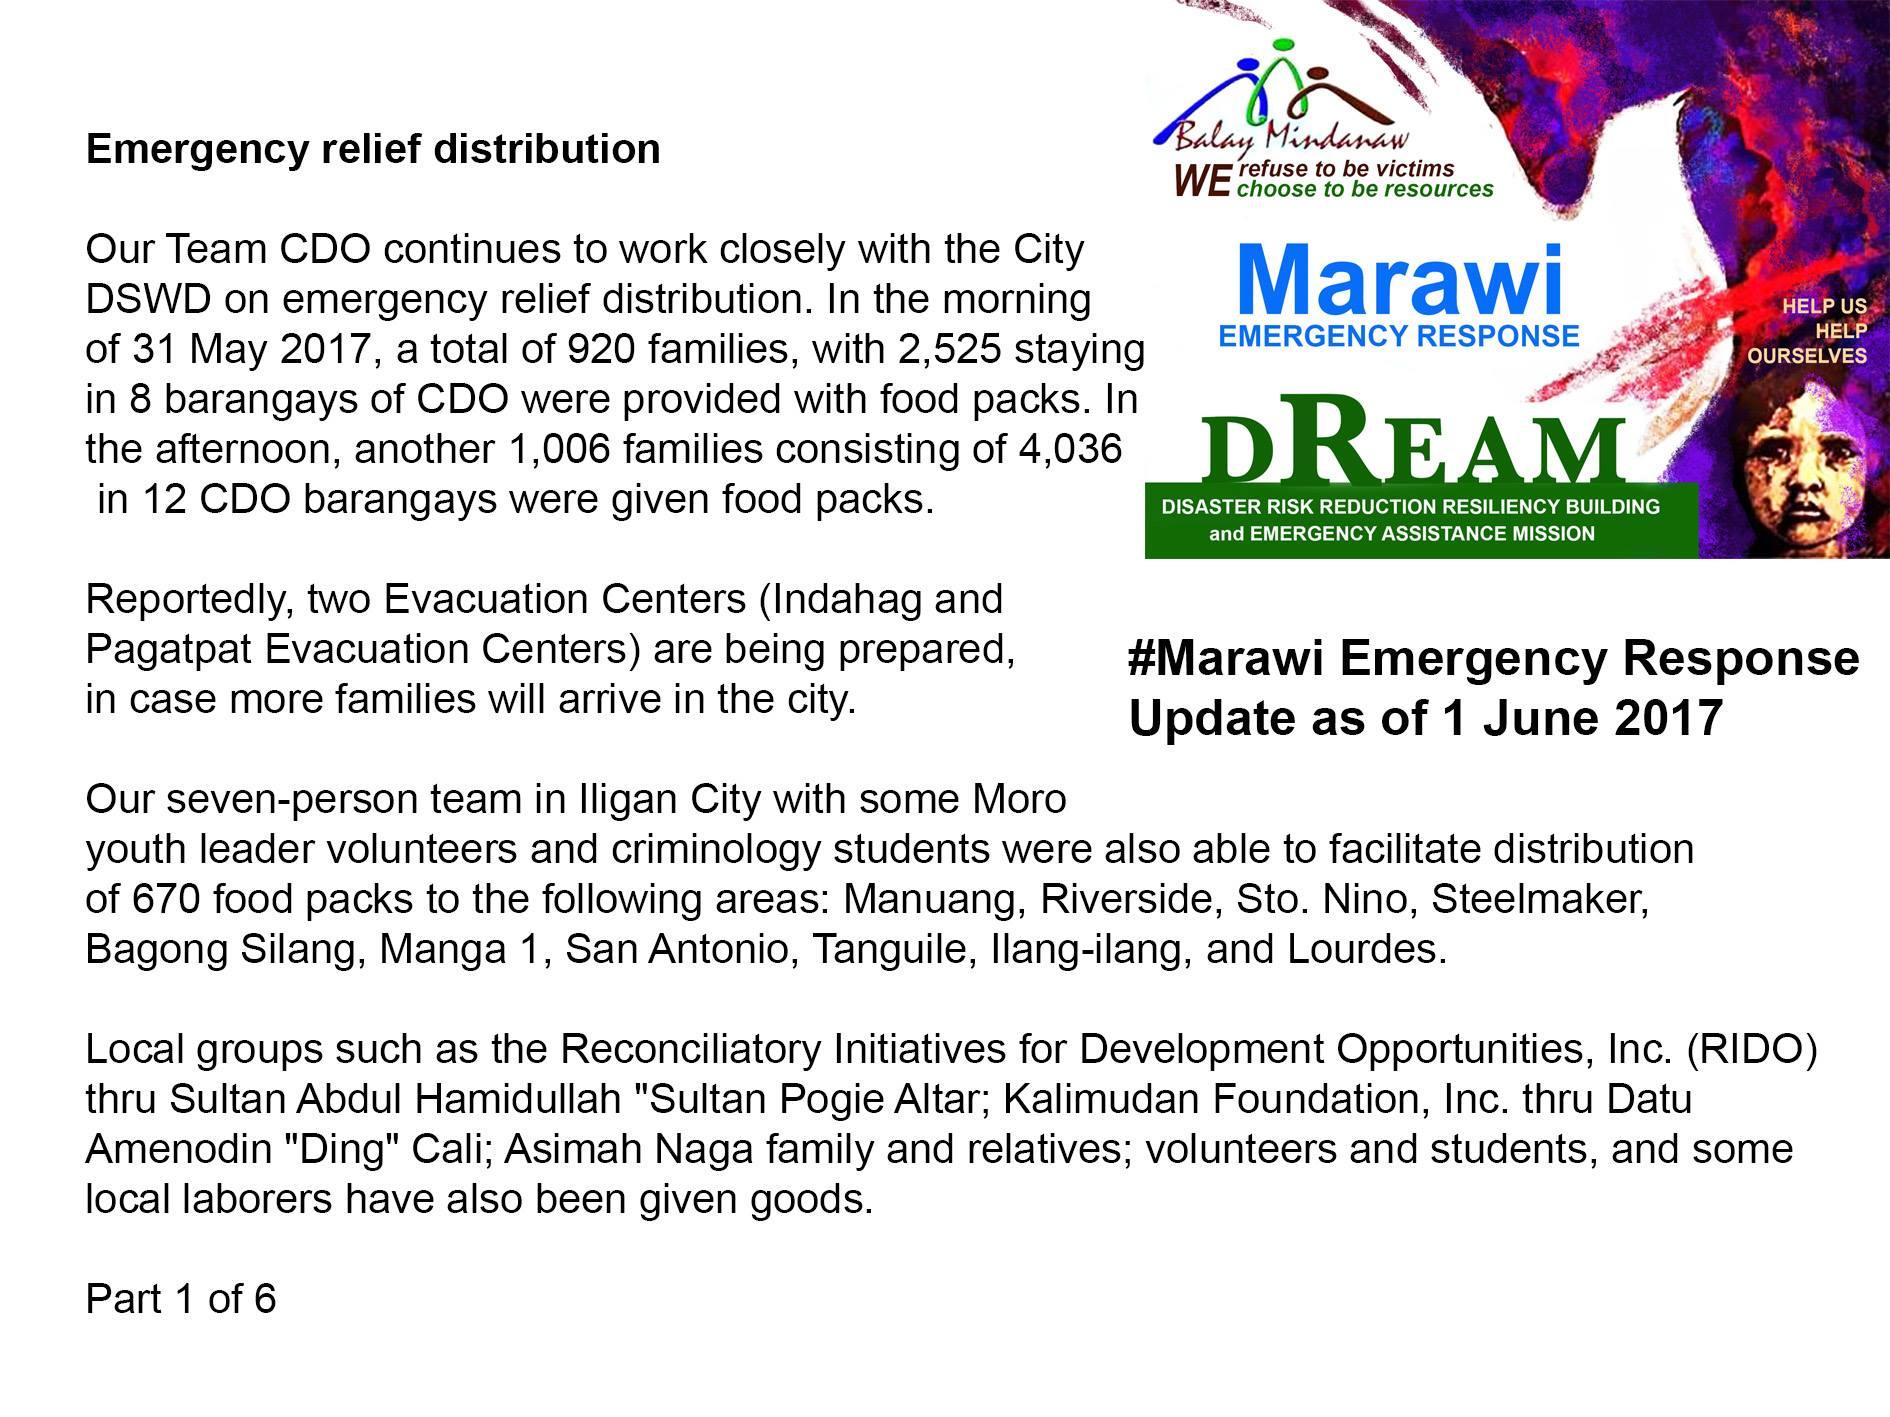 jun12017-Marawi-update-1